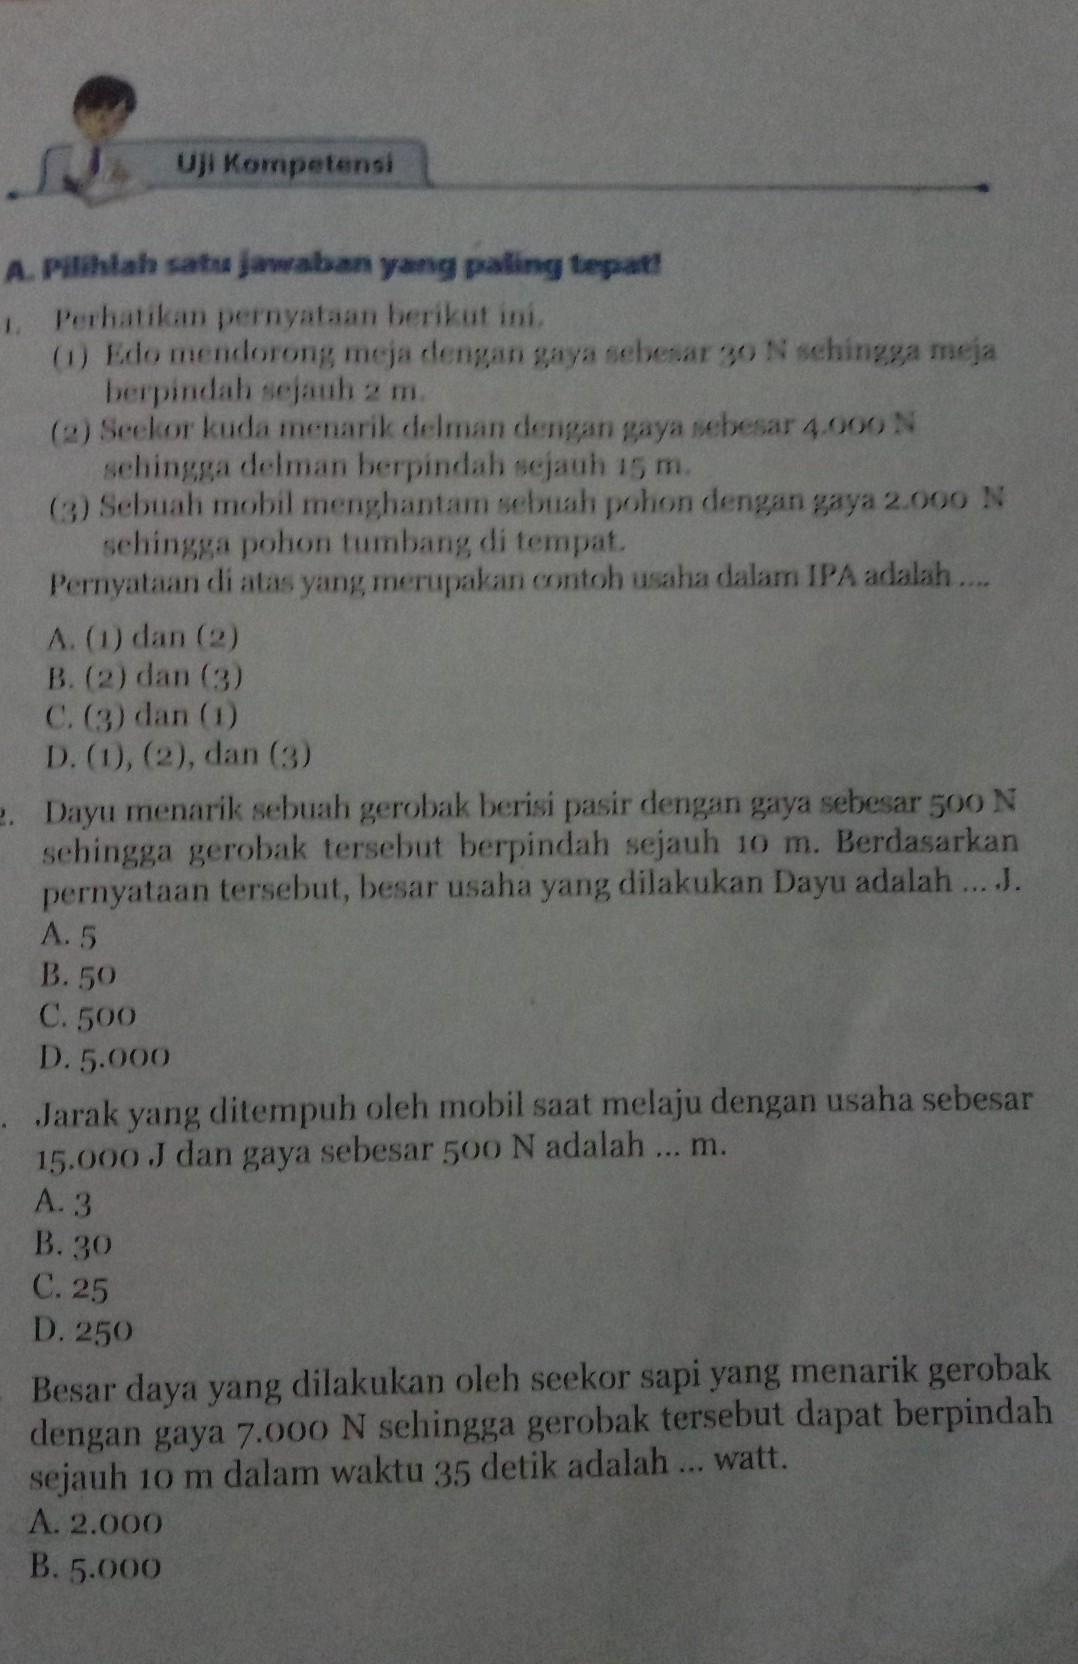 Uji Kompetensi Ipa Kelas 8 Halaman 99 - Revisi Sekolah